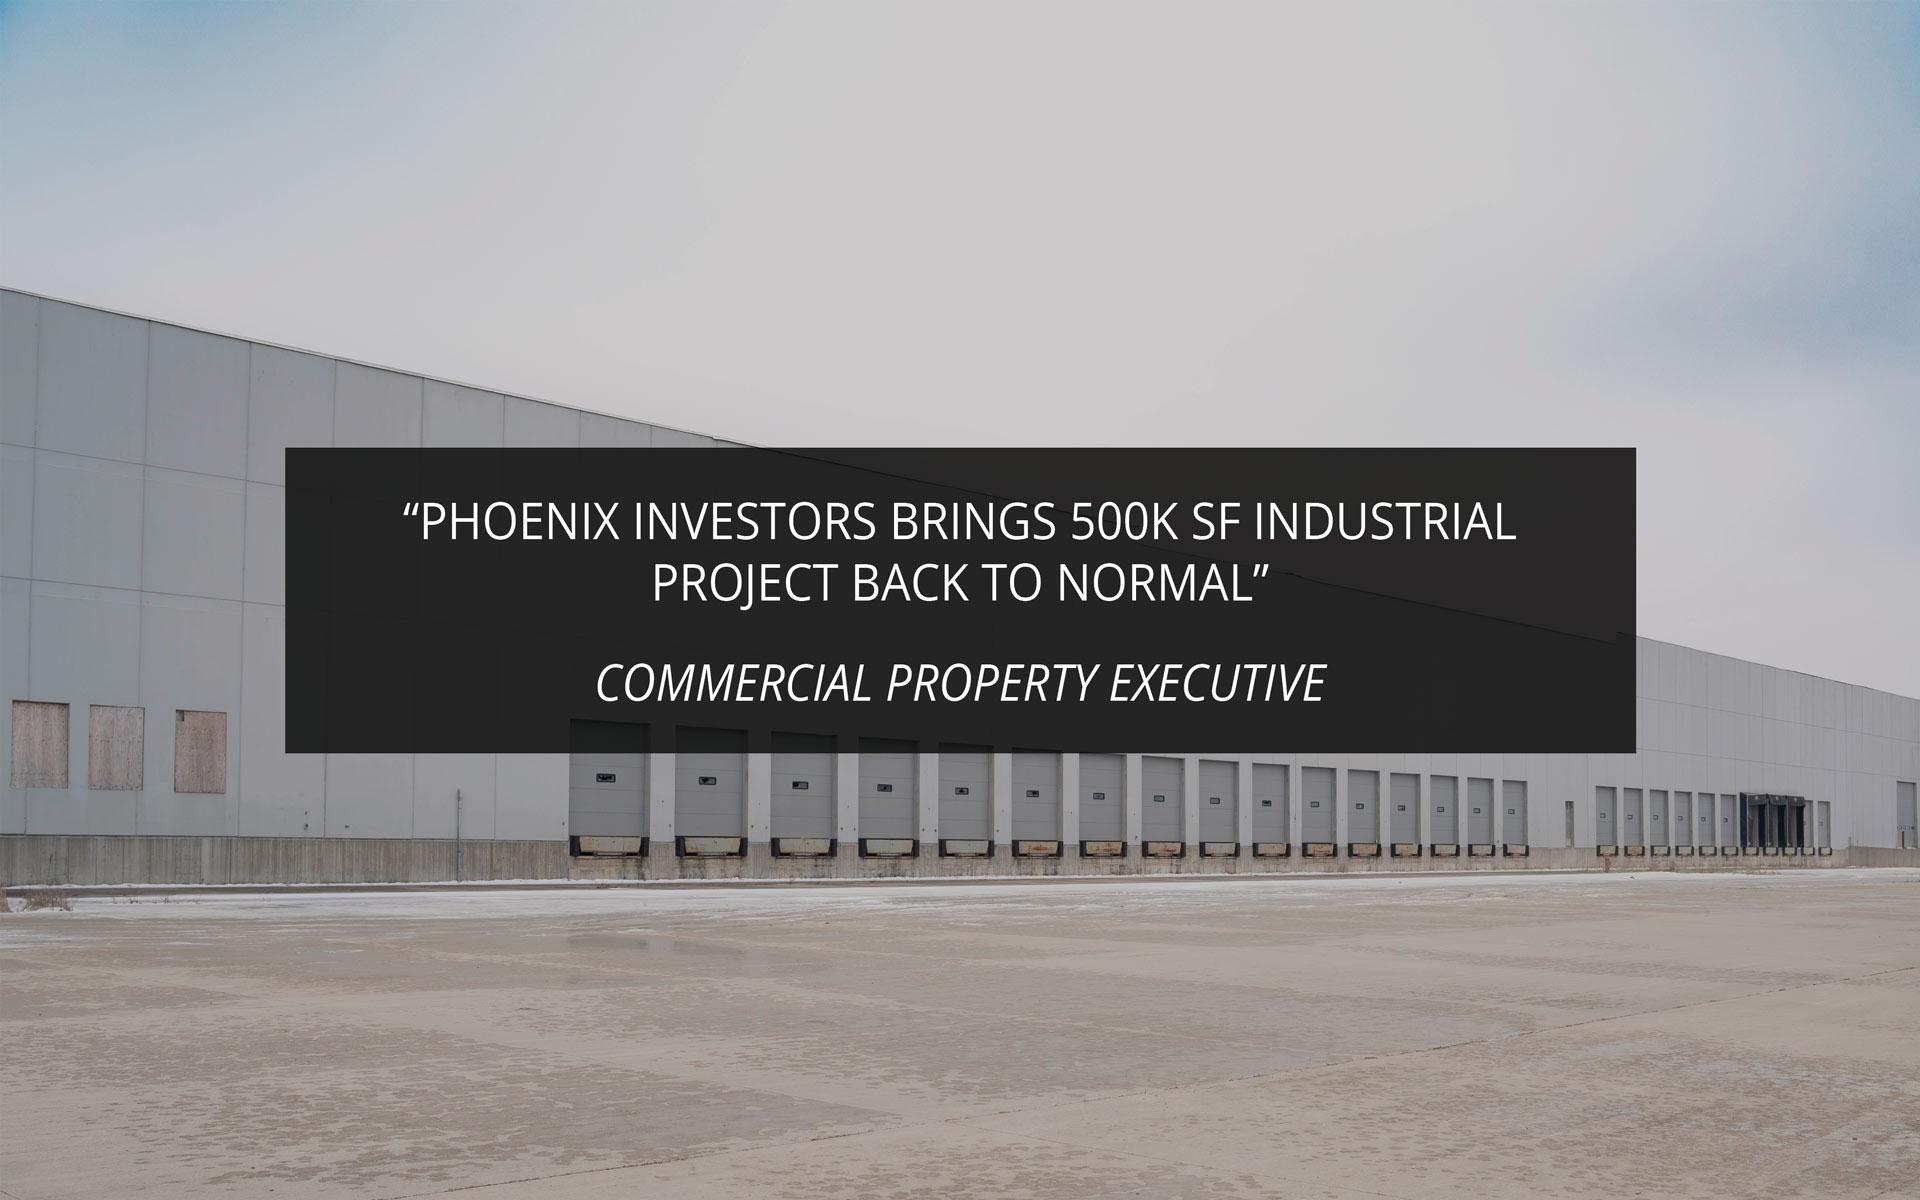 Phoenix Investors Brings 500K SF Industrial Project Back to Normal